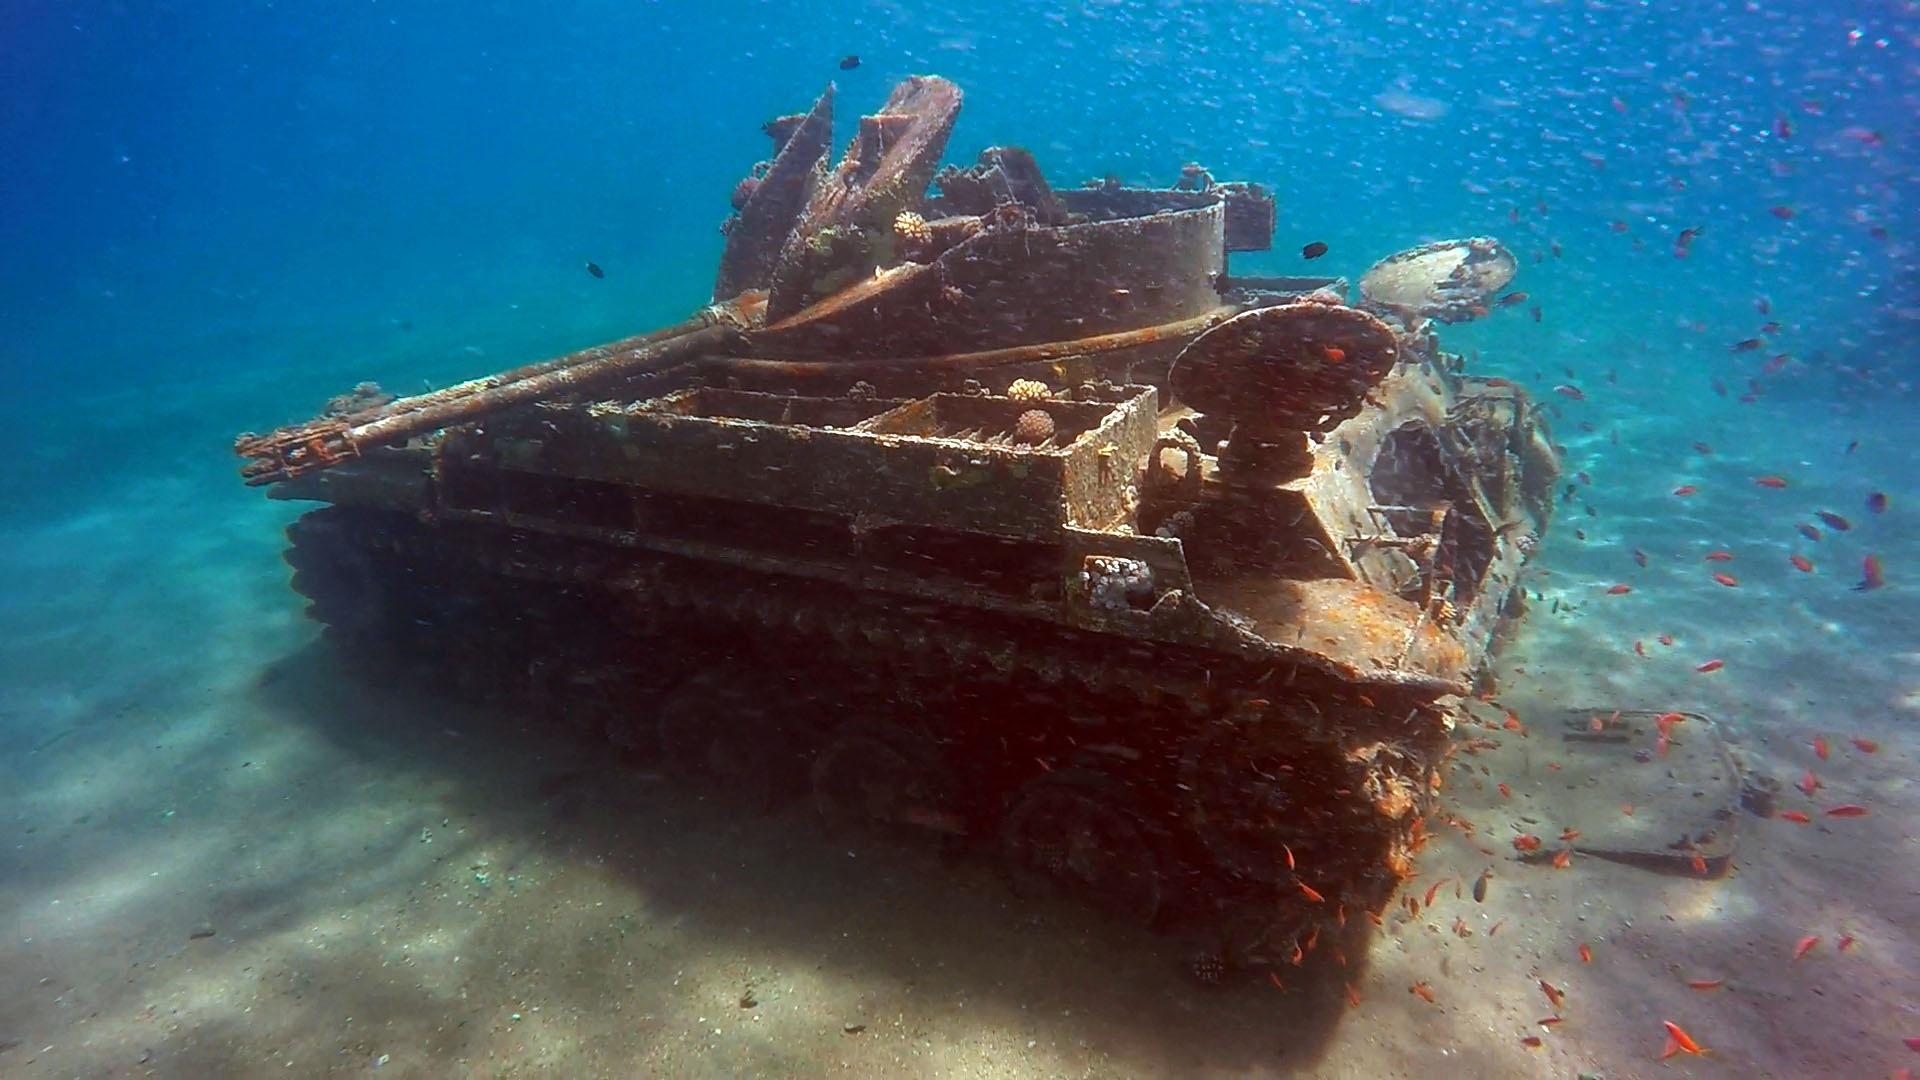 The tank by Hassan Alkadi